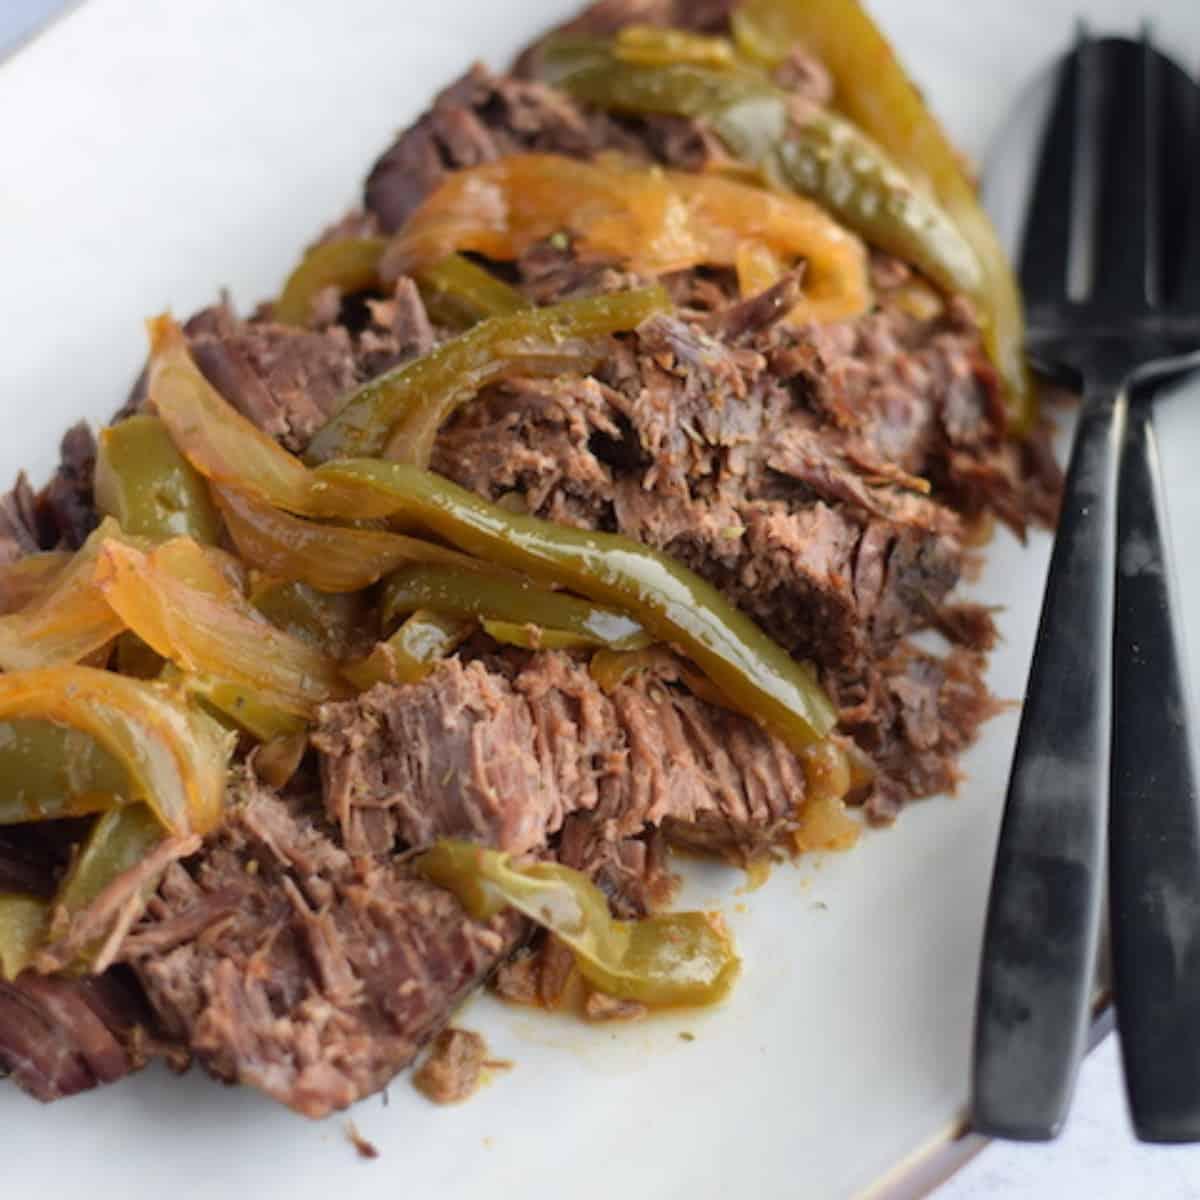 Italian roast beef on a white platter